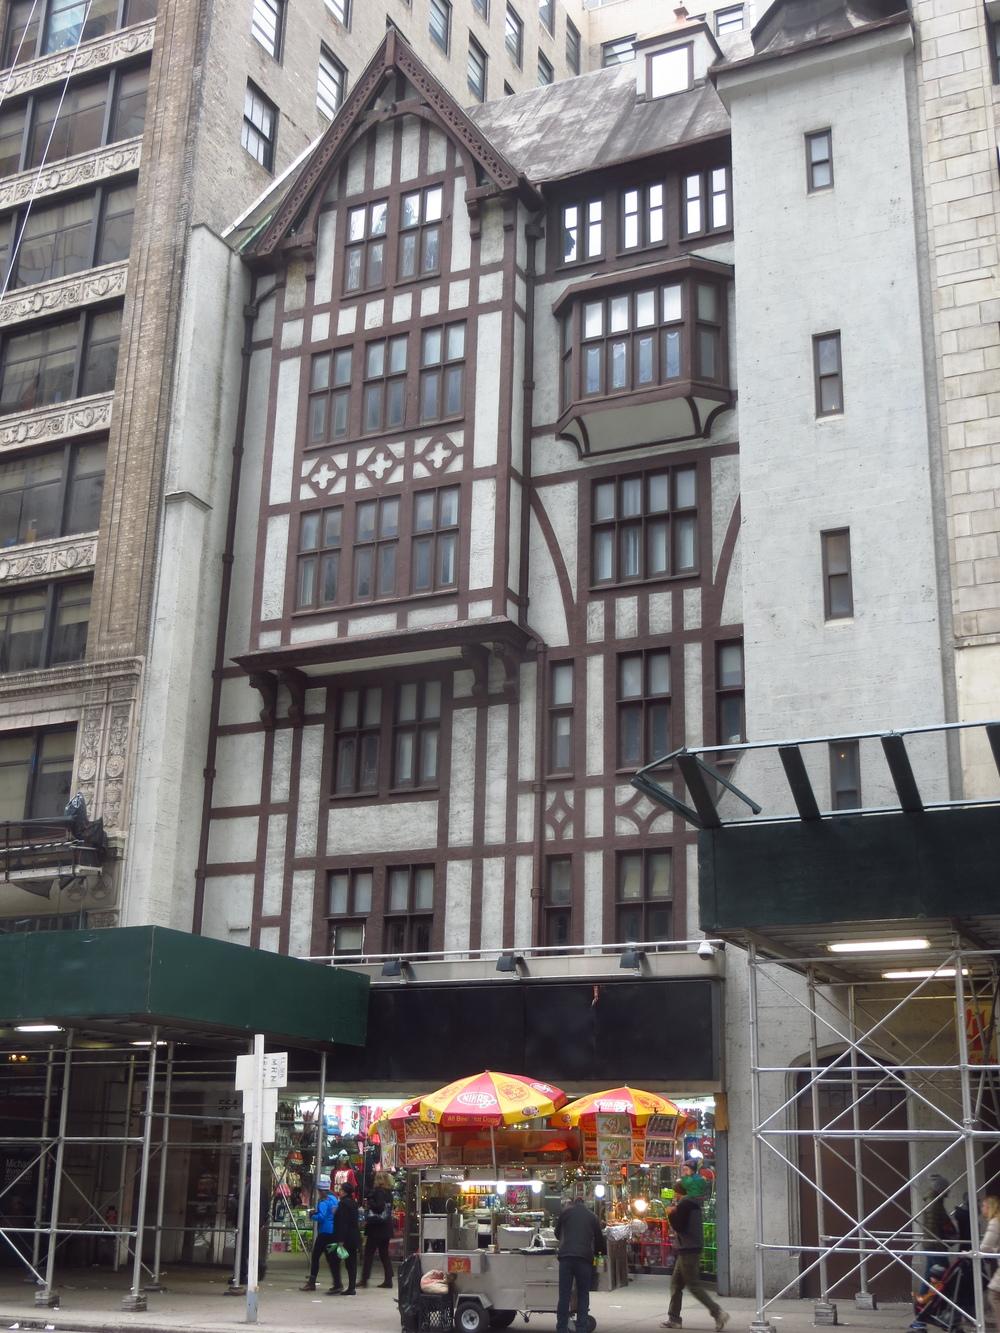 Incongruous Building